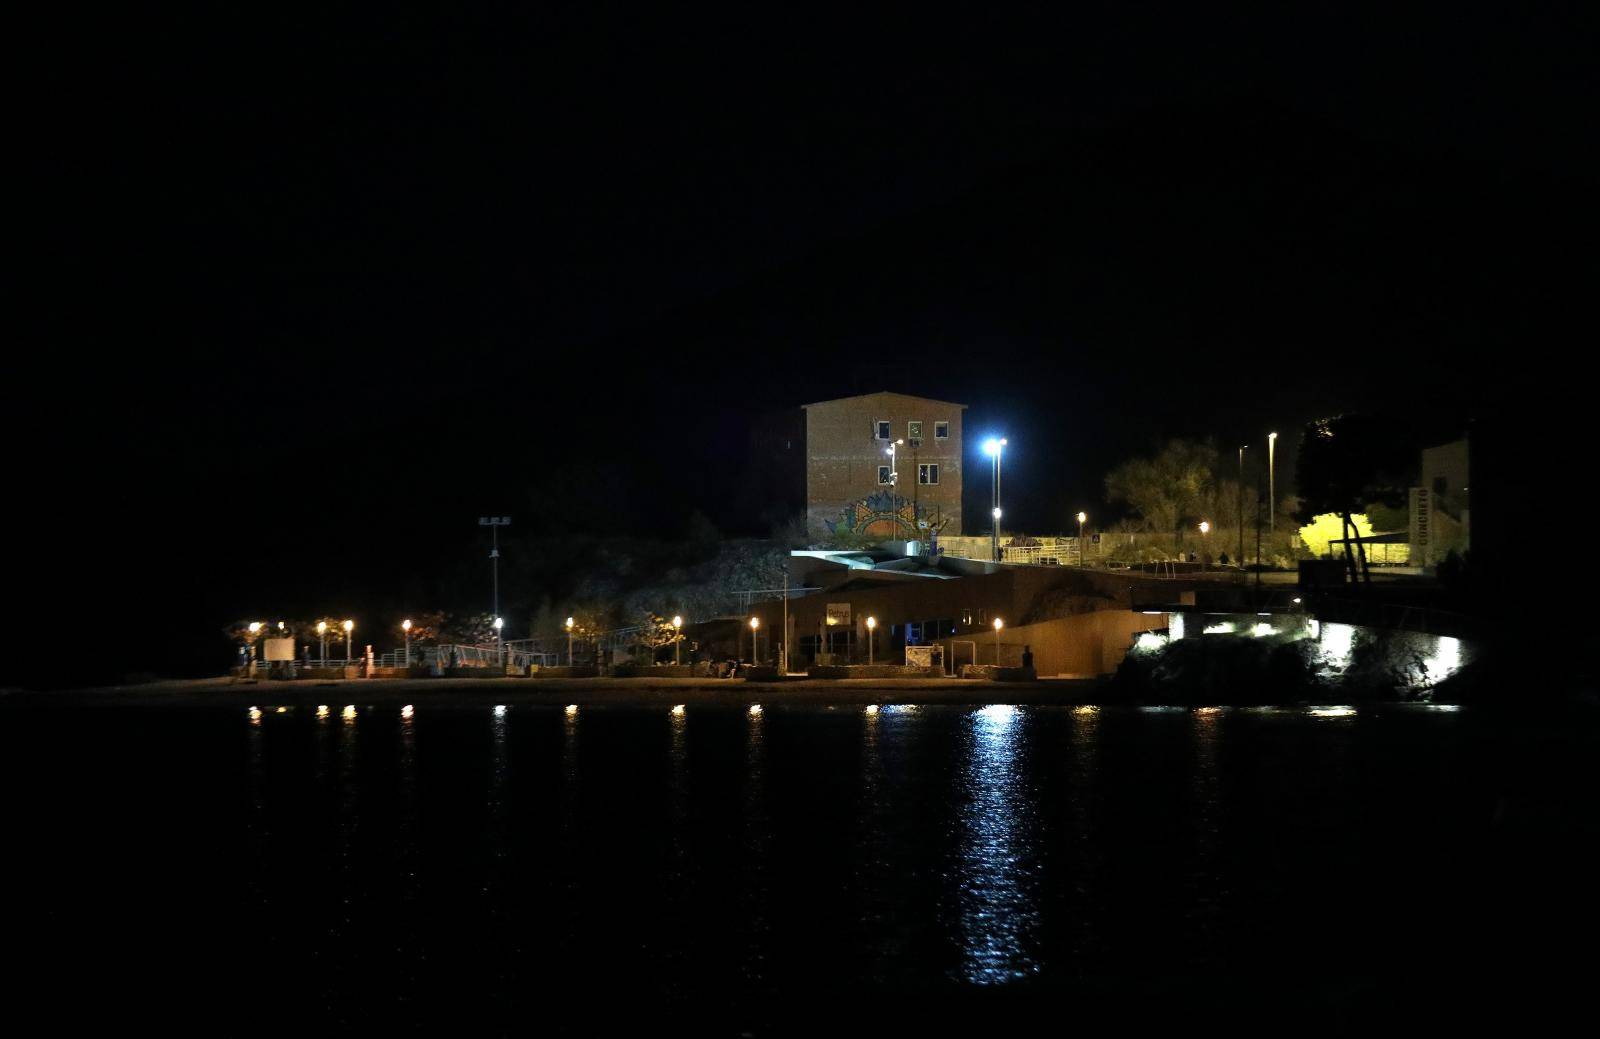 Grad Šibenik pridružio se globalnoj akciji Sat za planet Zemlju